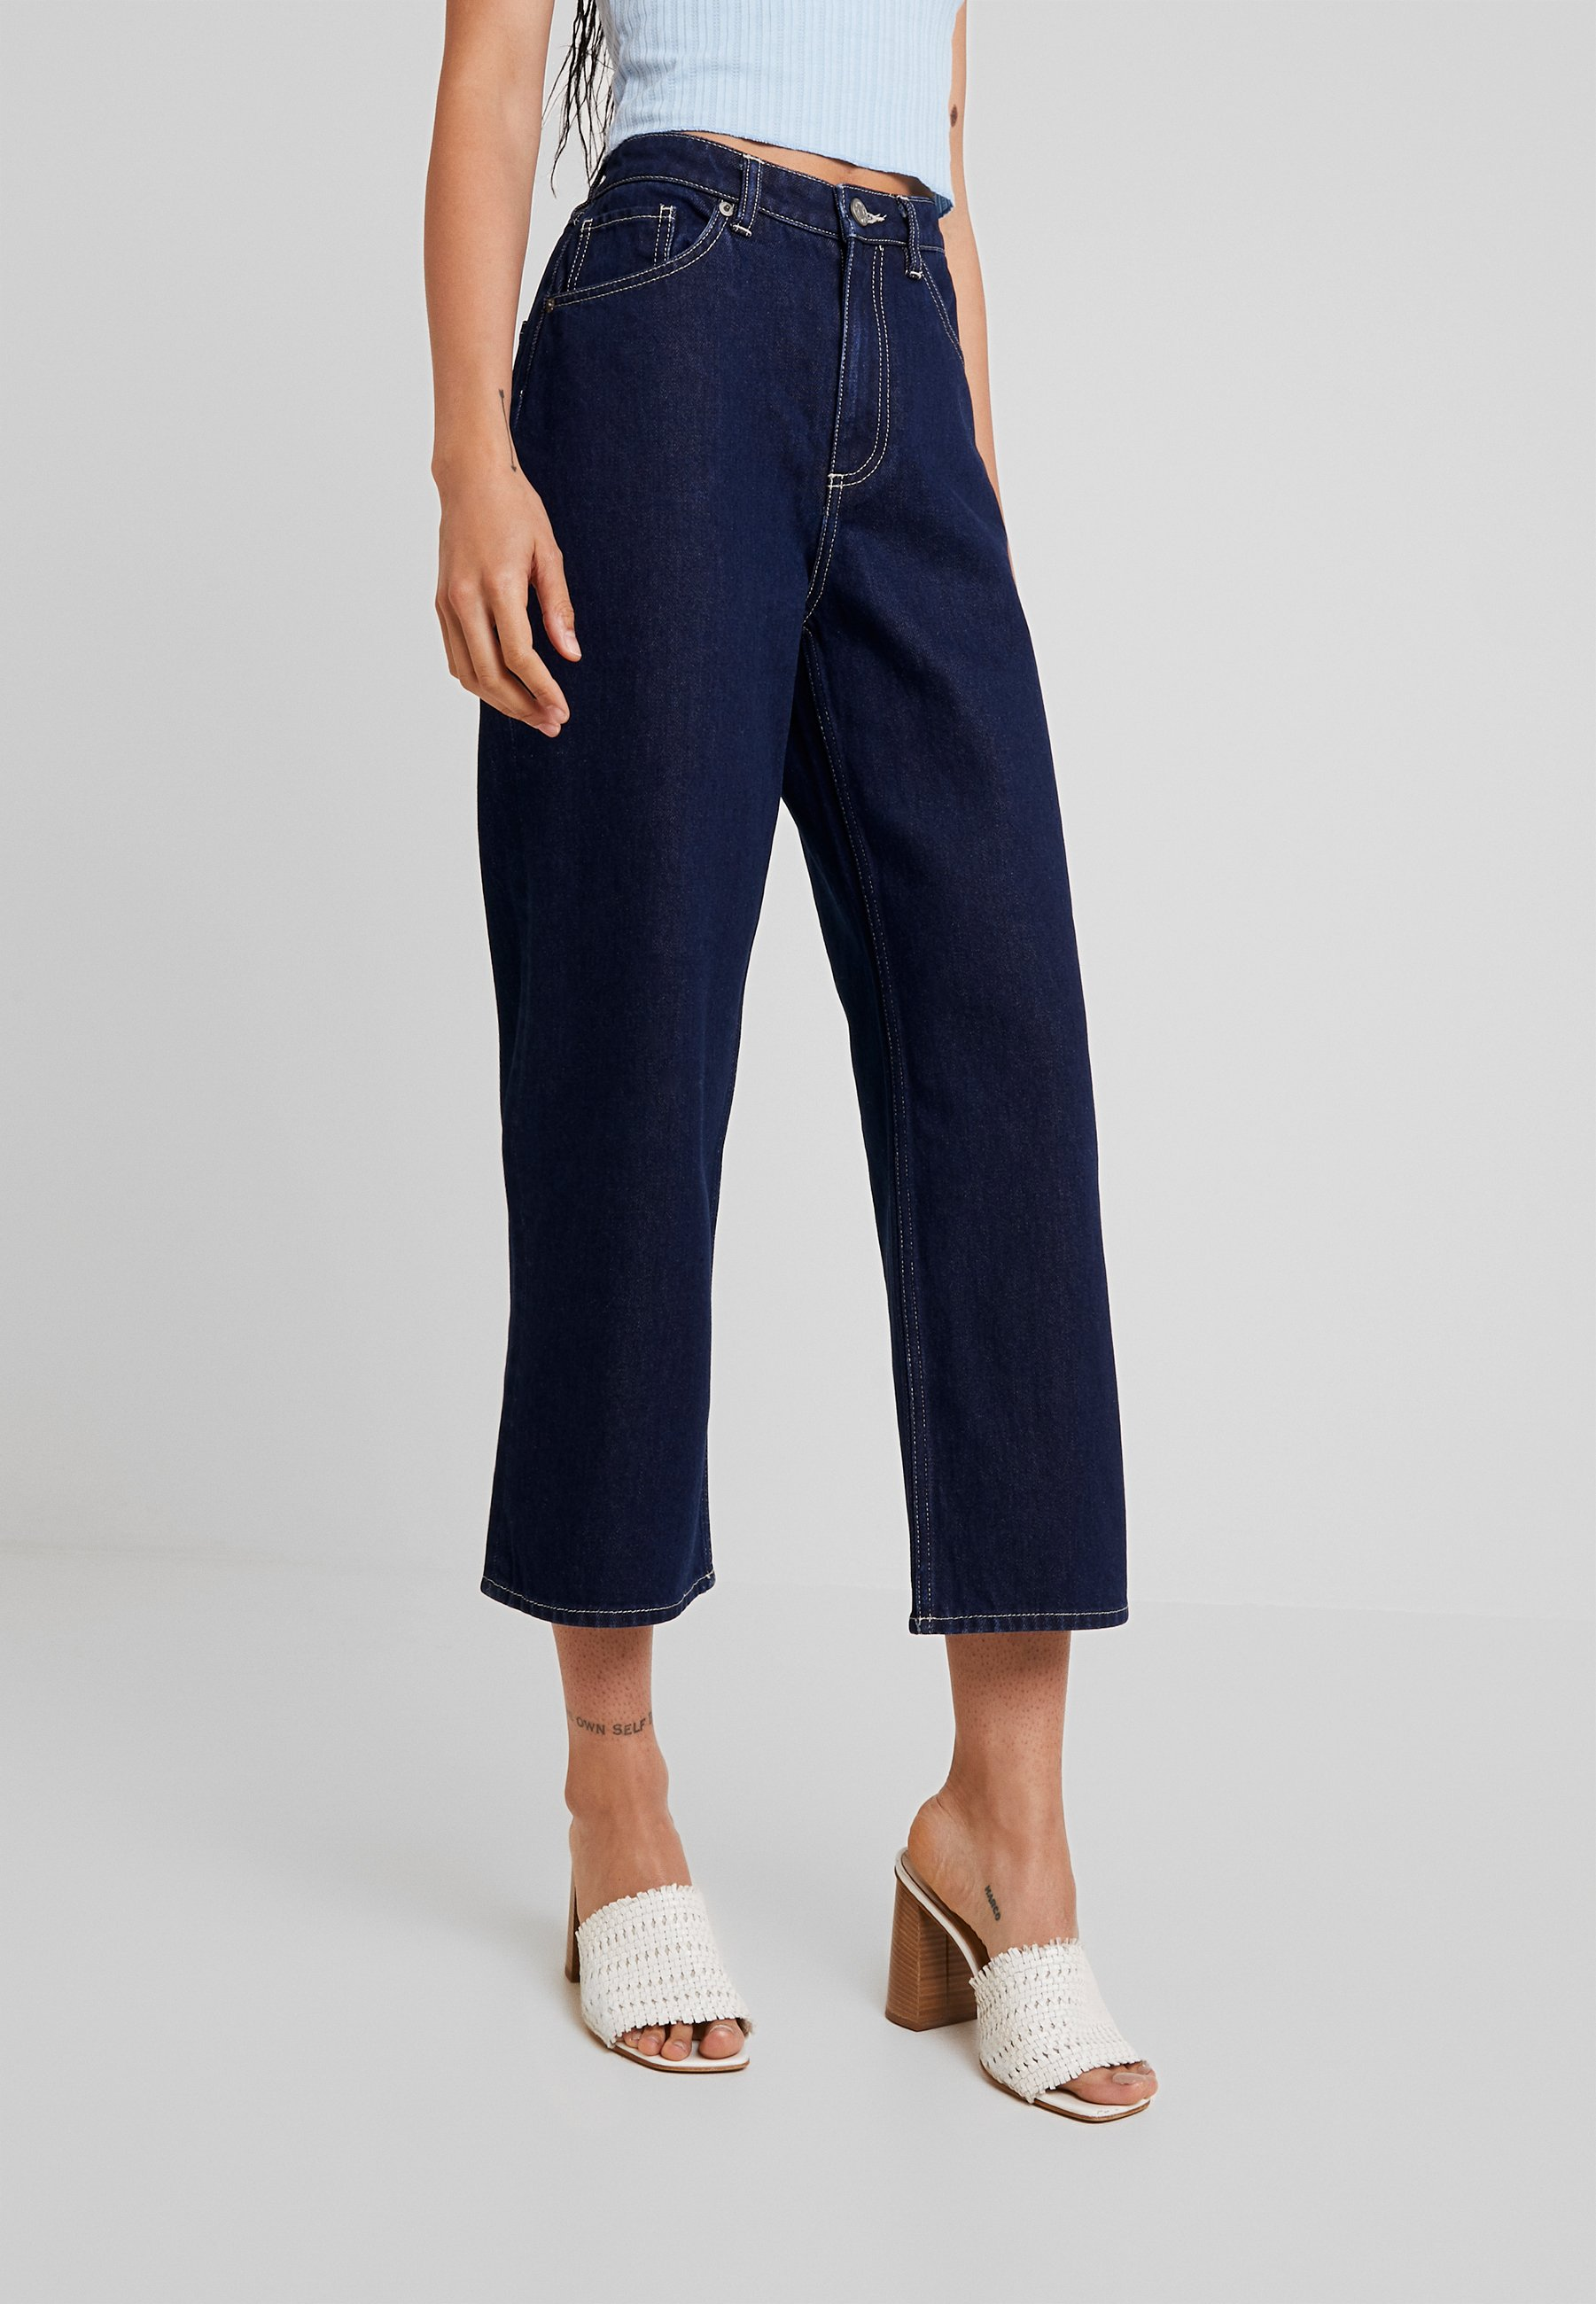 Monki MOZIK RINSE - Jeans a zampa dark blue rinse wash